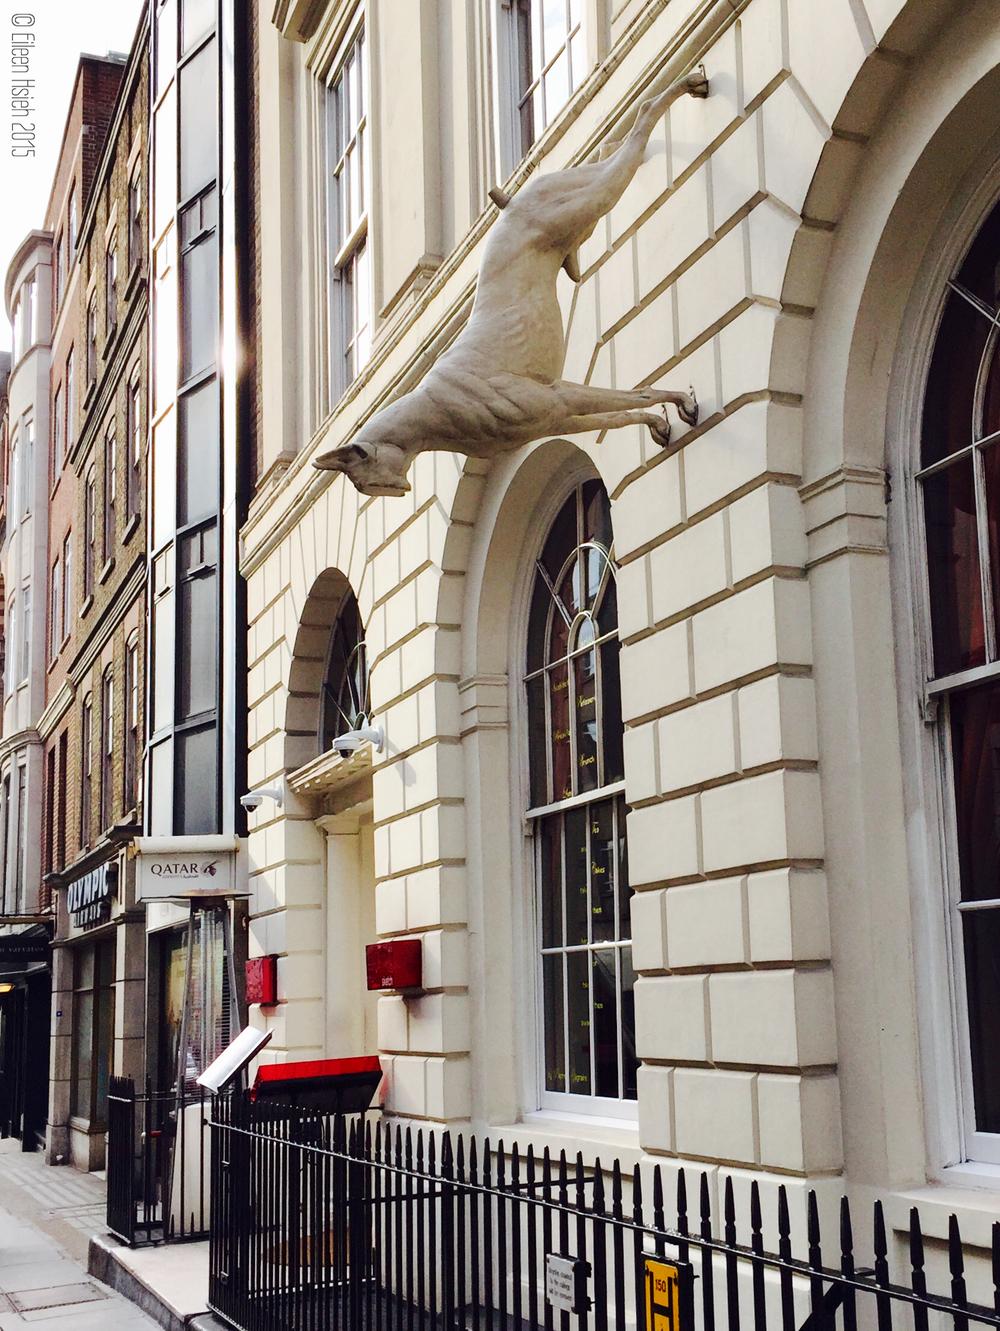 The Great Dane sculpture outside of Sketch. 門外挑戰地心引力的丹麥獵犬雕塑。© Eileen Hsieh